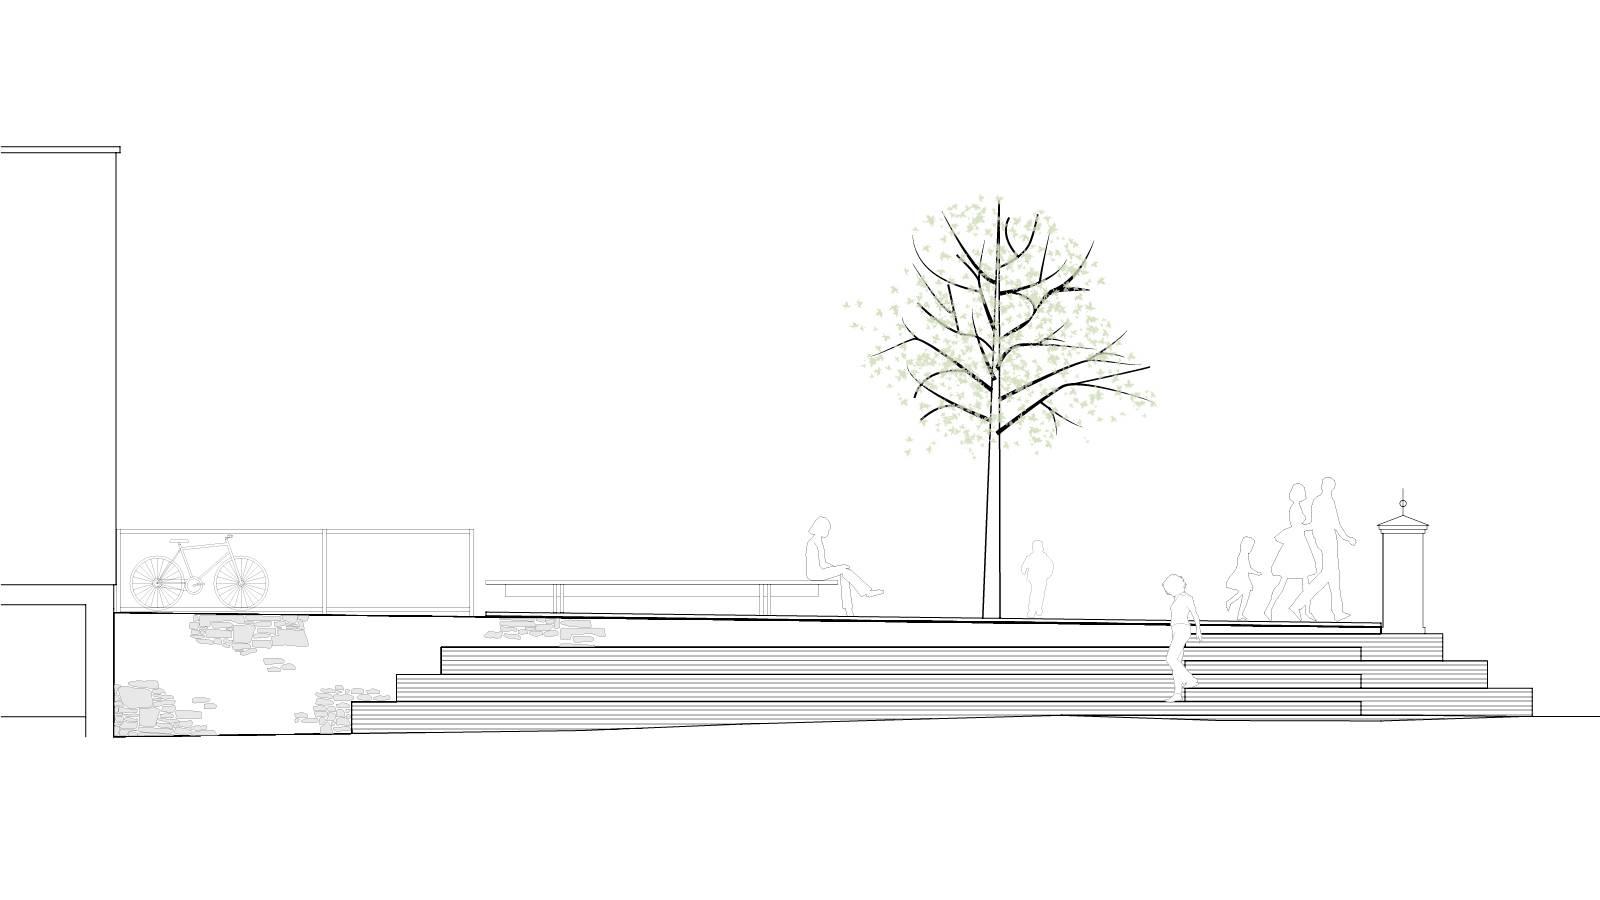 ELEVATION AMPHI STAIRCASE - St. Sunniva School Yard - SPOL Architects